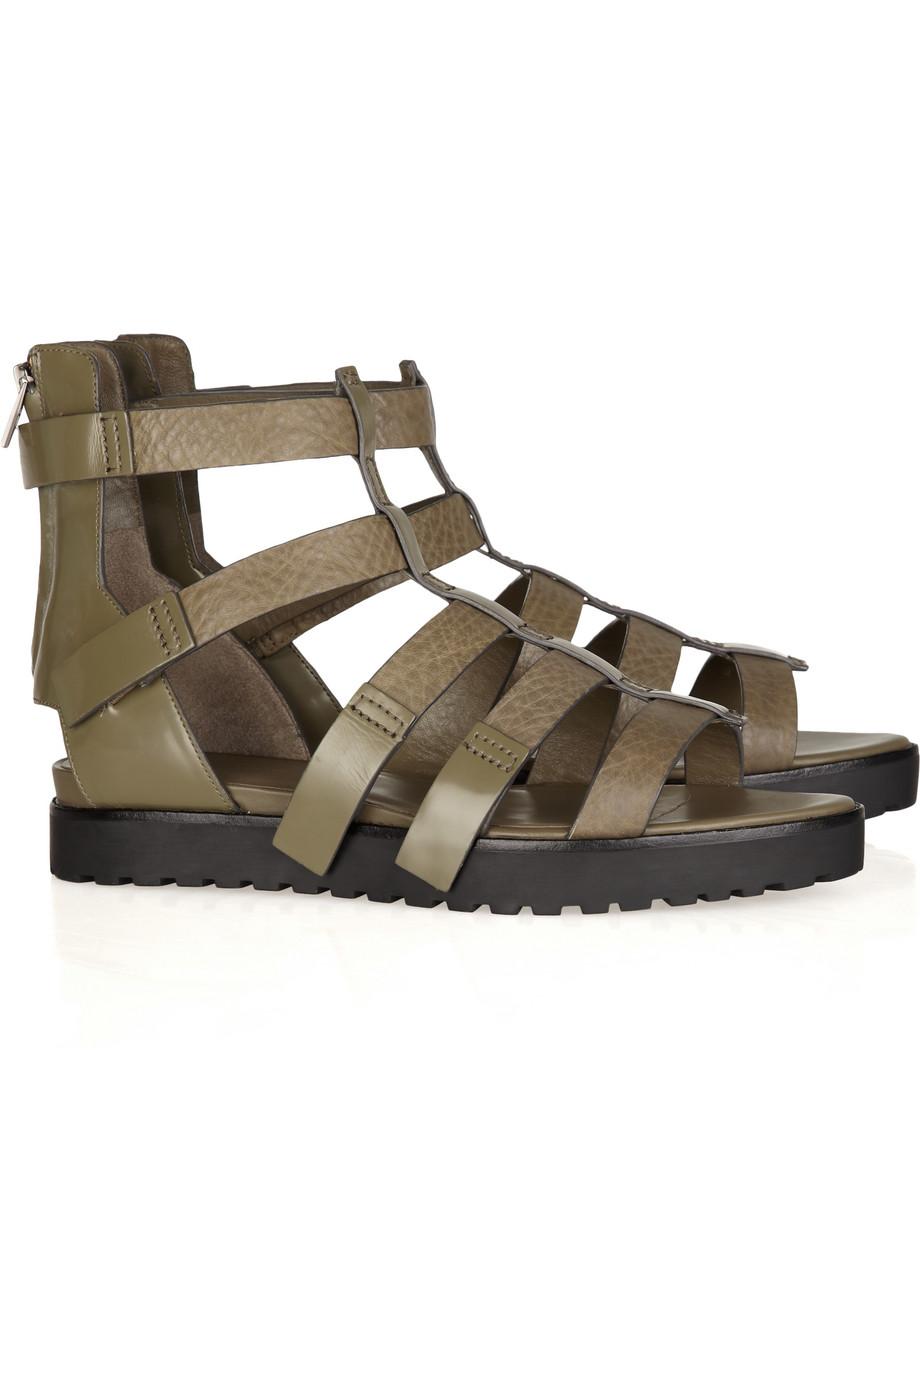 3a08d2e81b1c Lyst - Alexander Wang Saskia Leather Gladiator Sandals in Metallic